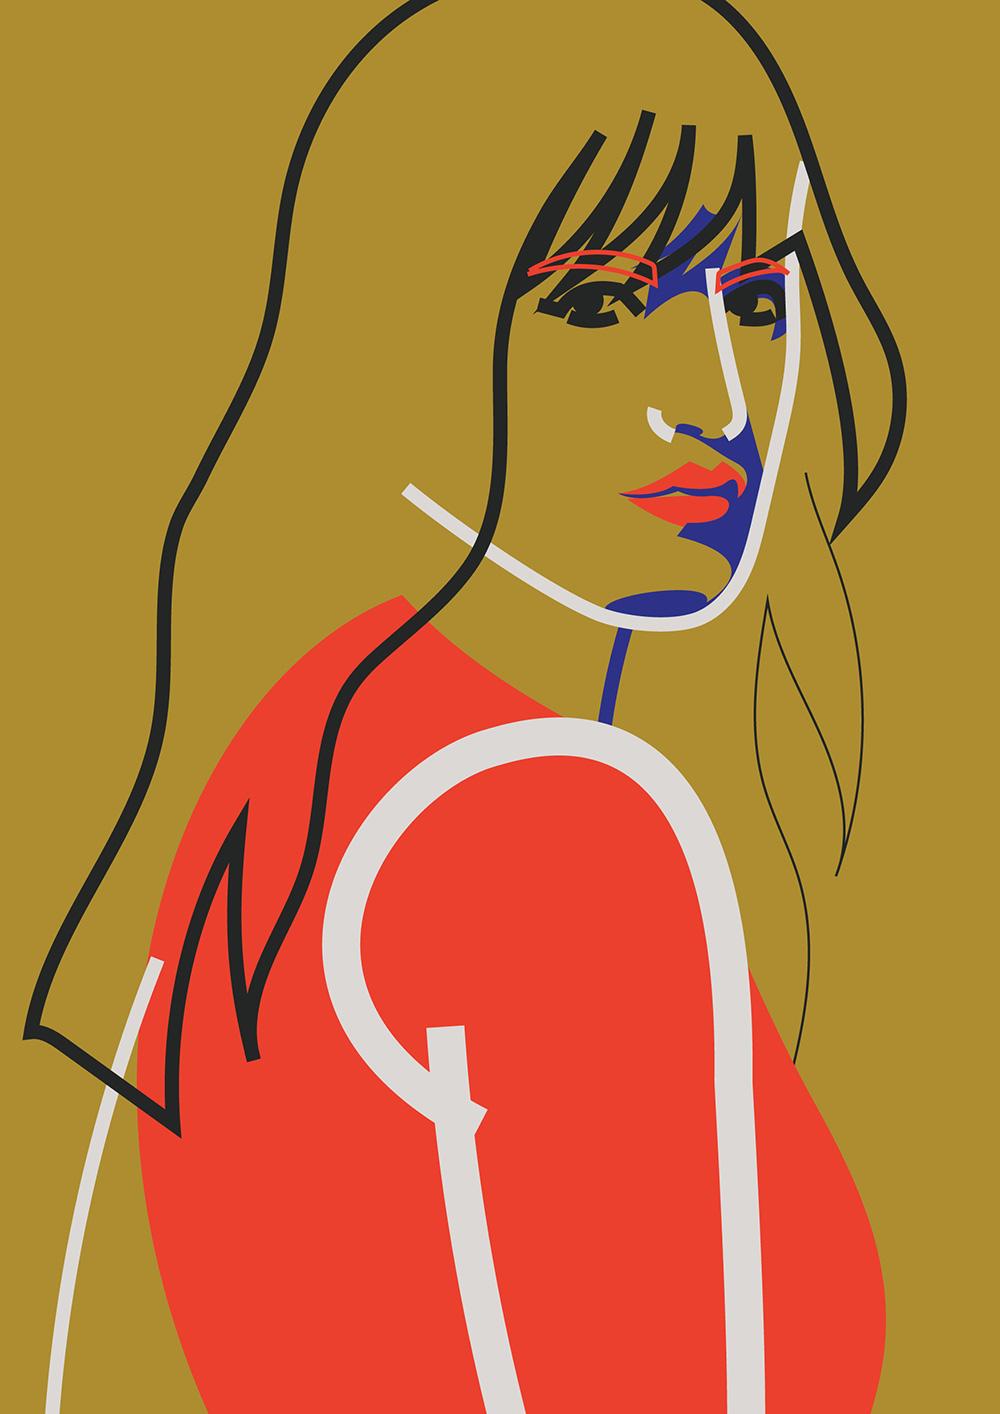 01-Portrait-JeanneDamas-FIUTendencias.jpg